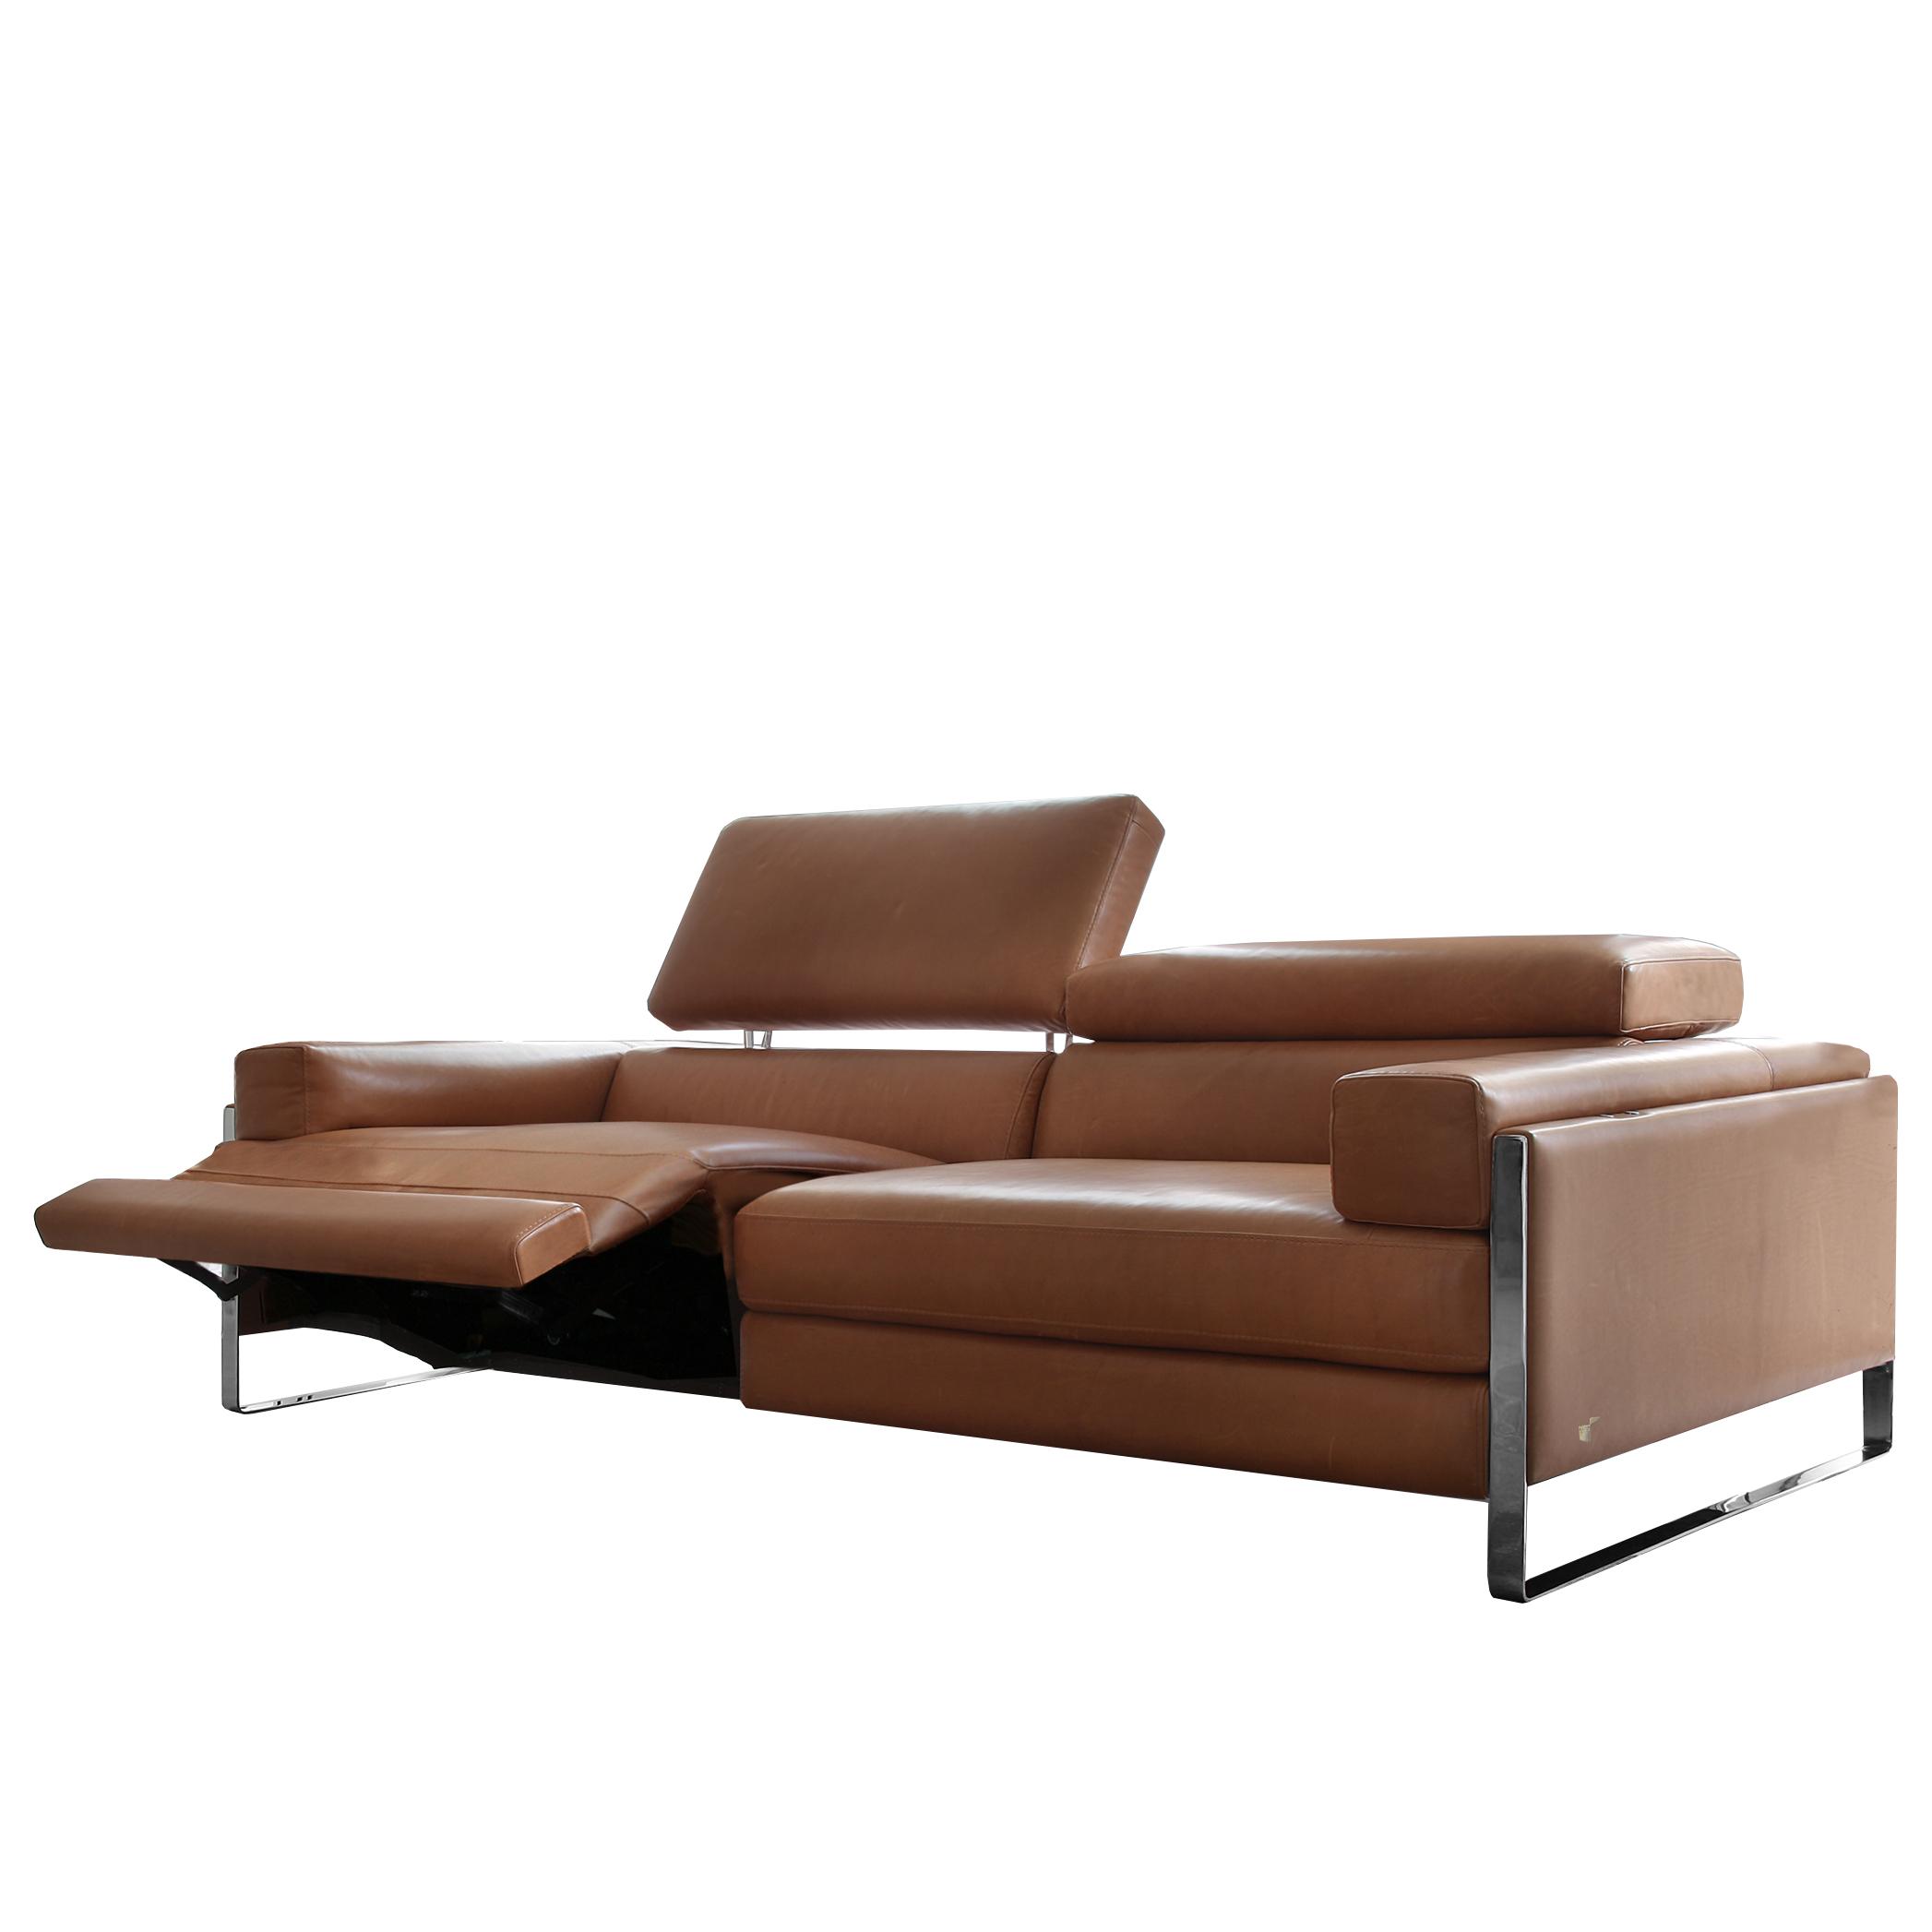 Romeo Relax Gt Blend Furniture